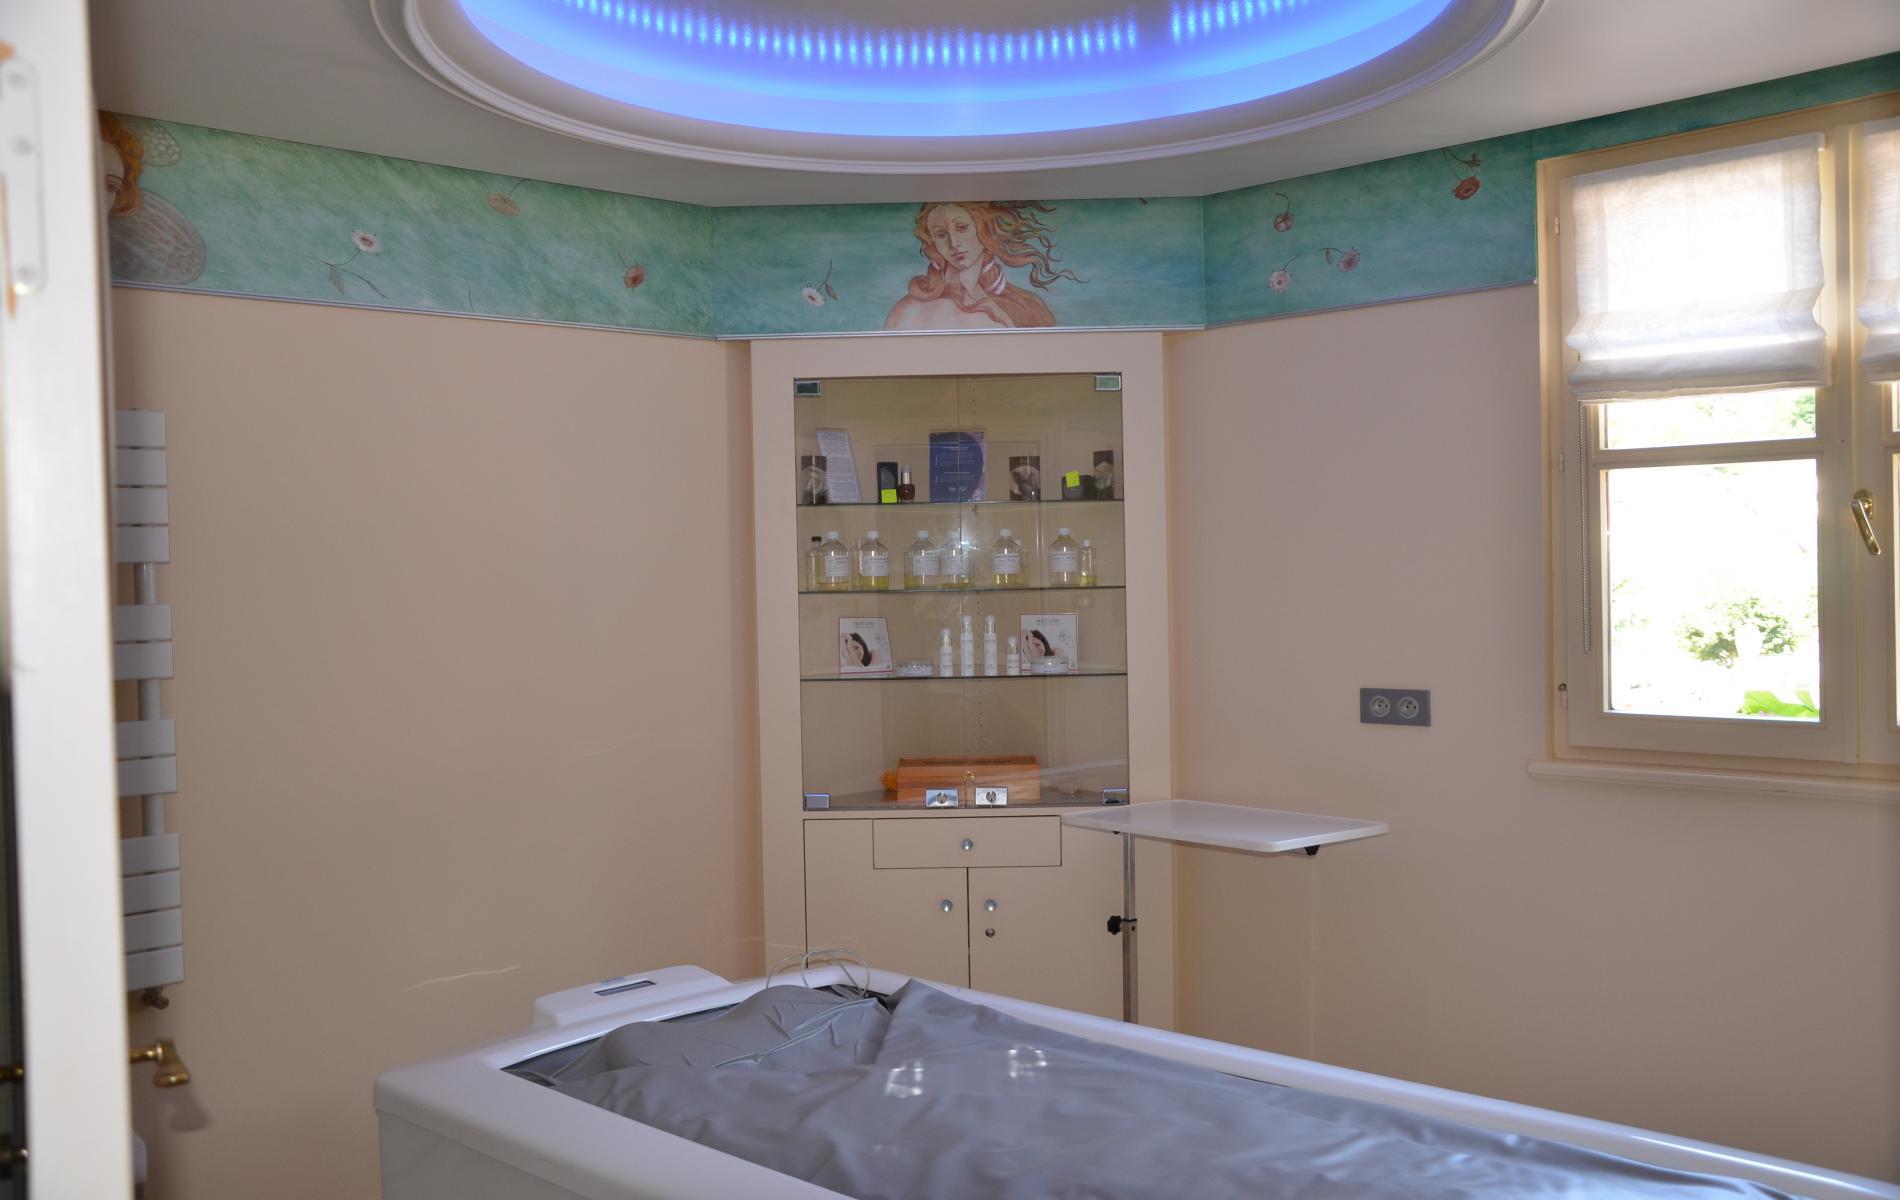 Thermo-spa ou lit de flottaison